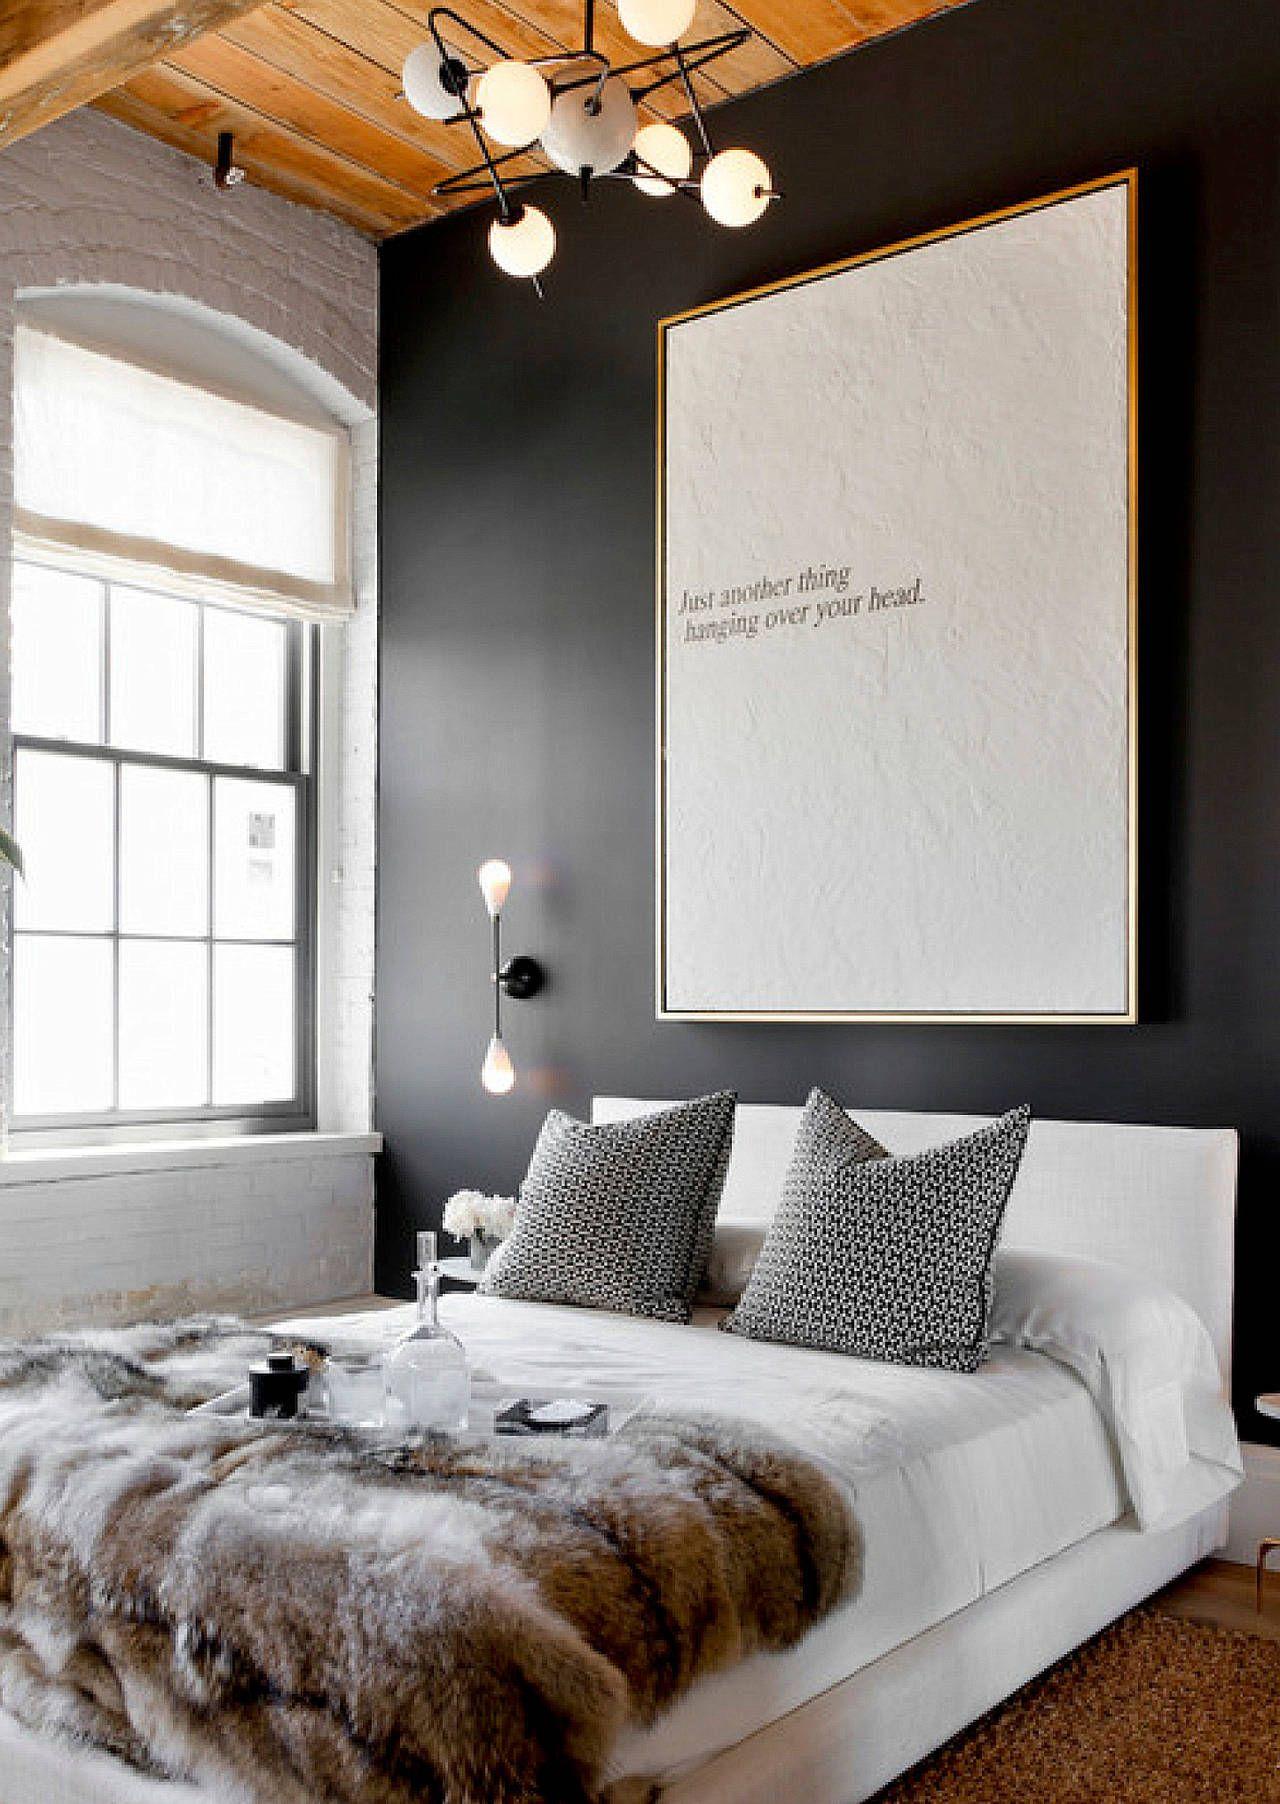 Black design inspiration for a master bedroom decor wall